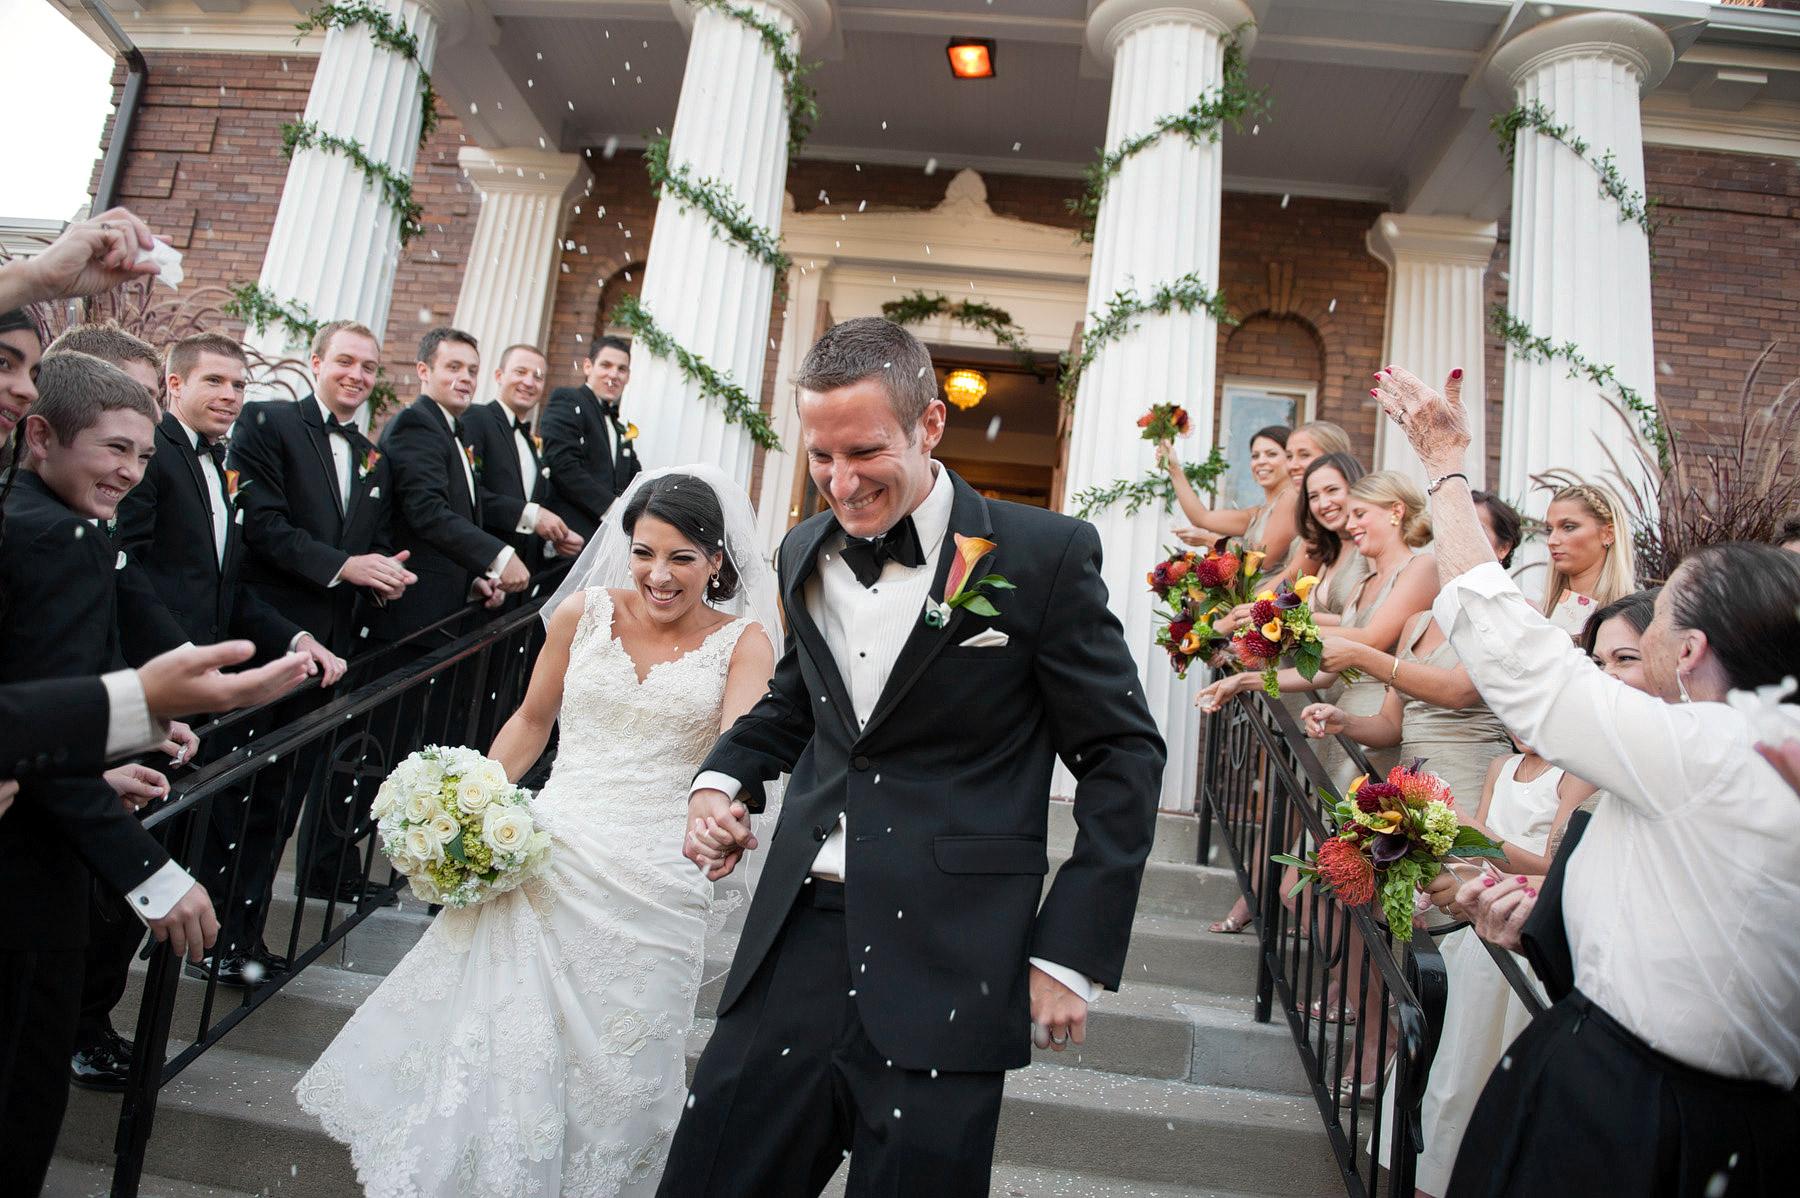 wedding-photography-saint-paul-mark-kegans-644.jpg